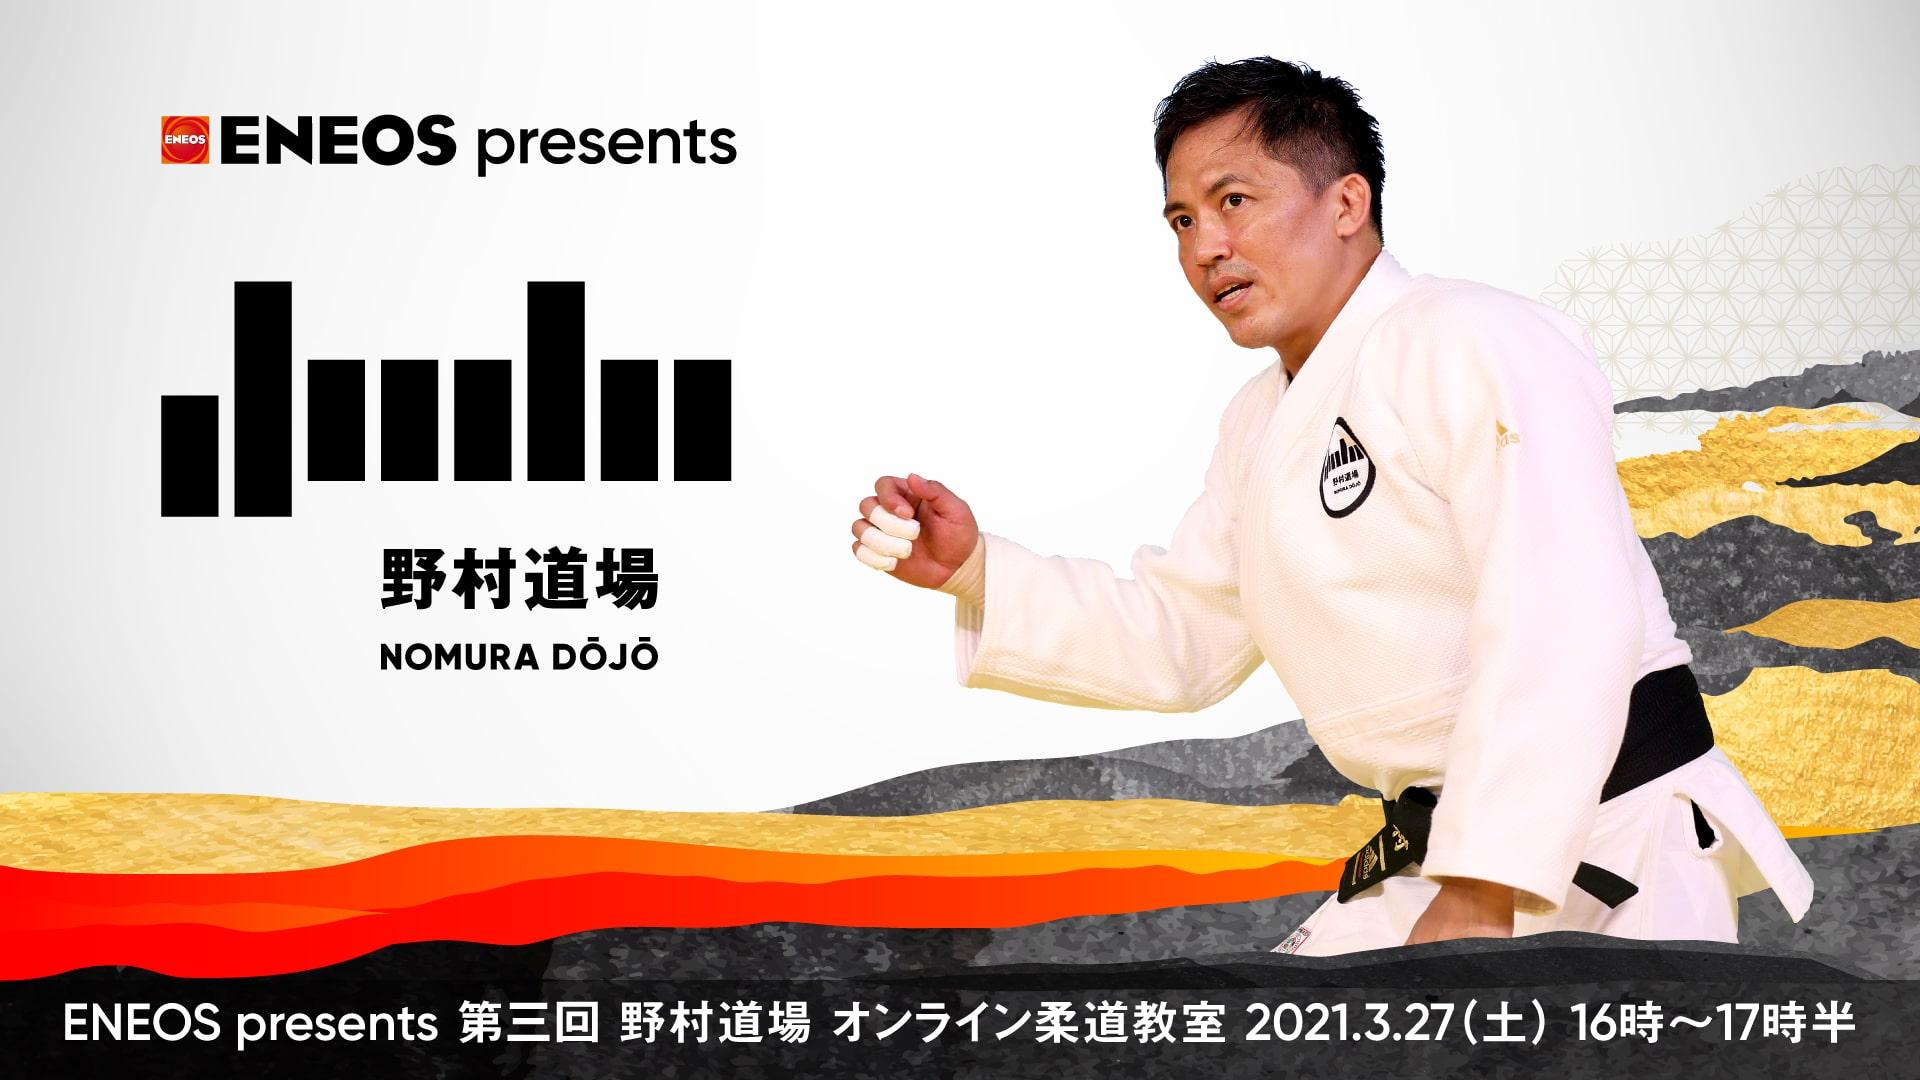 ENEOS presents 第三回 野村道場 オンライン柔道教室 3月27日(土)開催